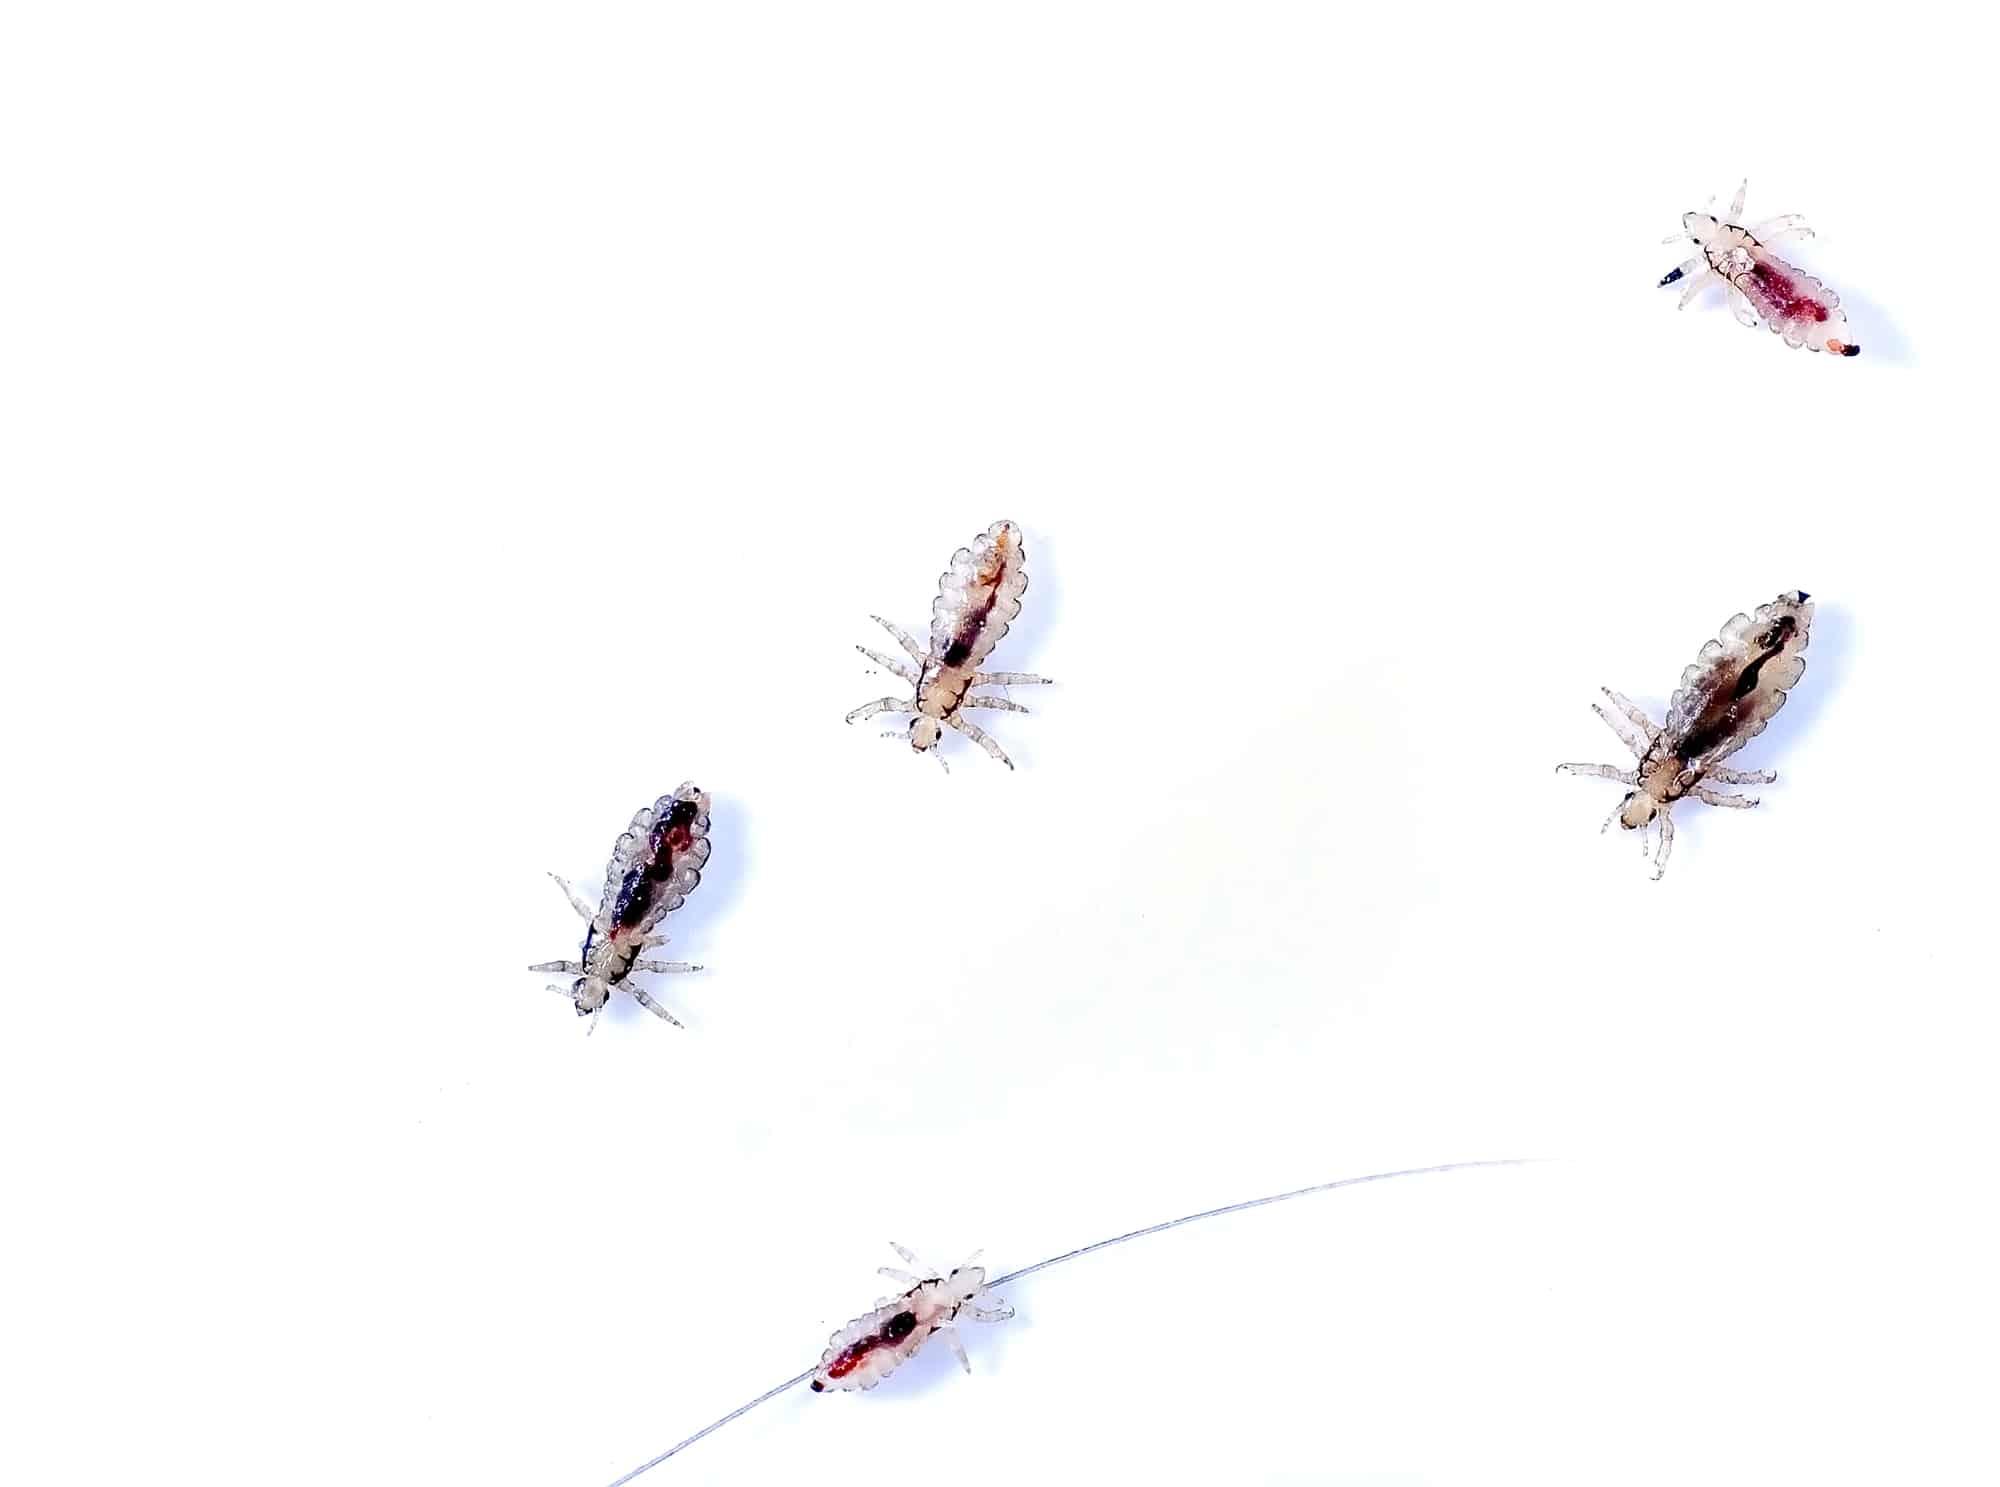 Head Lice *shudders*